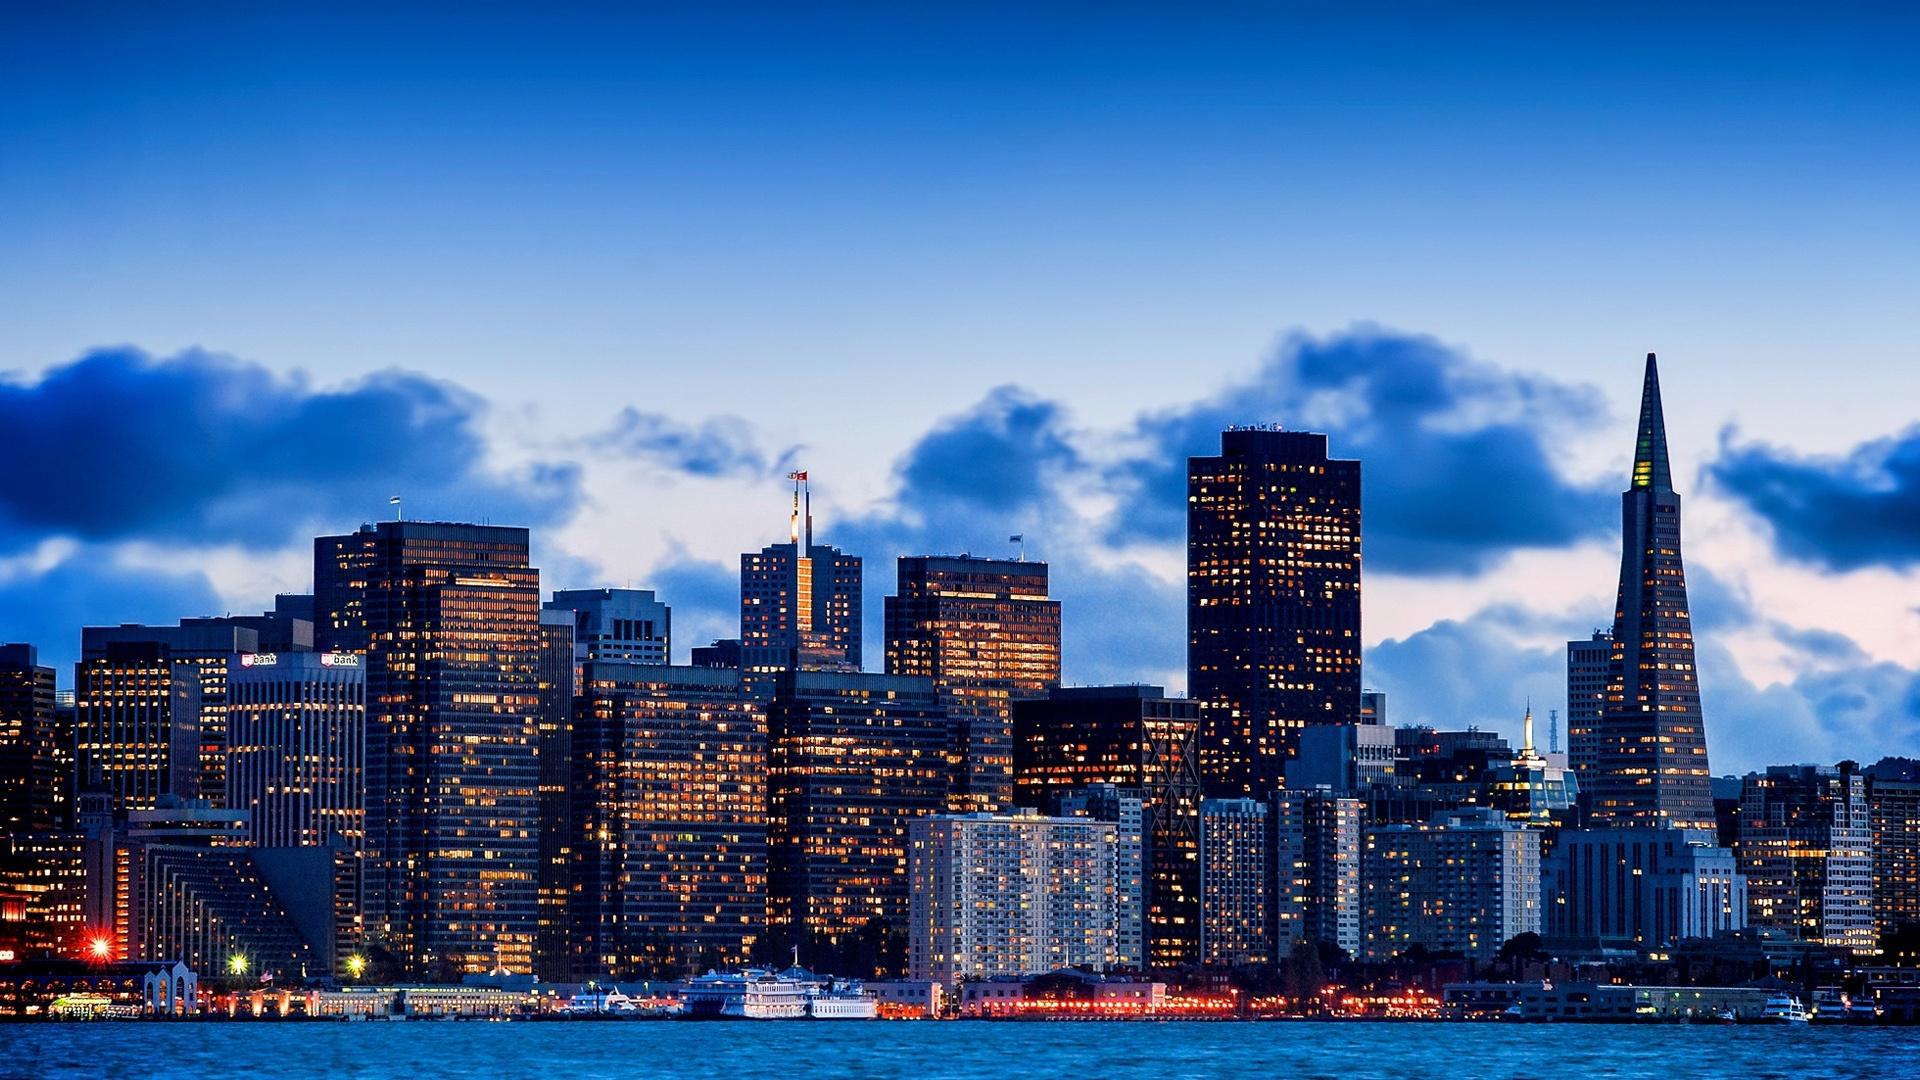 Hd wallpaper city - San Francisco Kalifornien Usa Stadt Bucht Abend